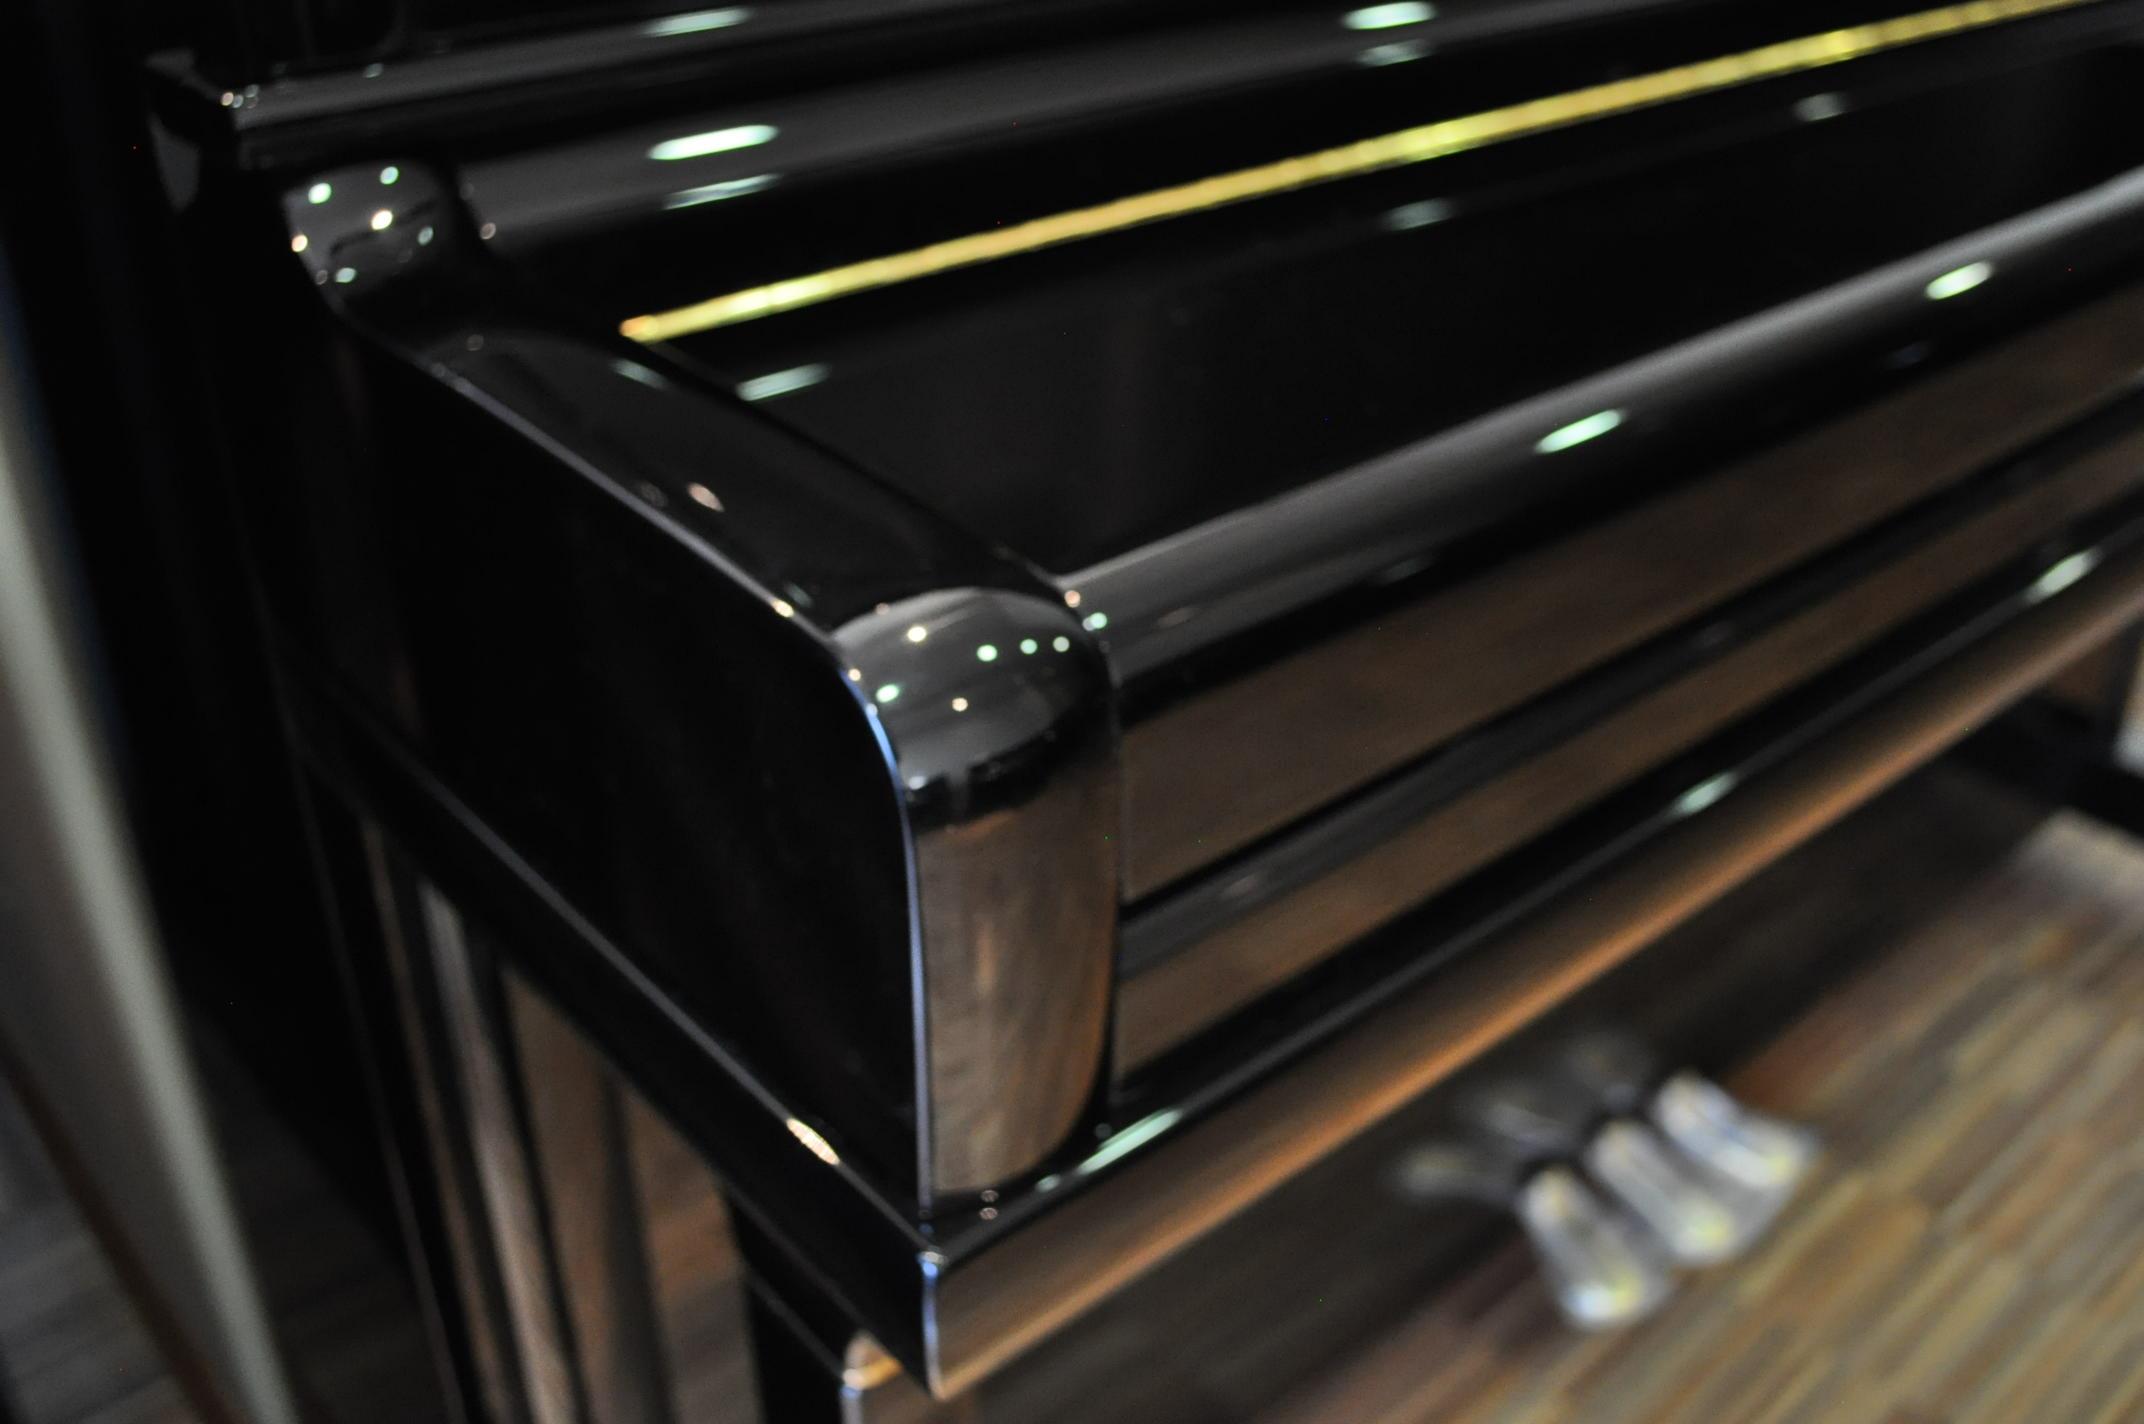 yamaha-klavier-px-124 (4)